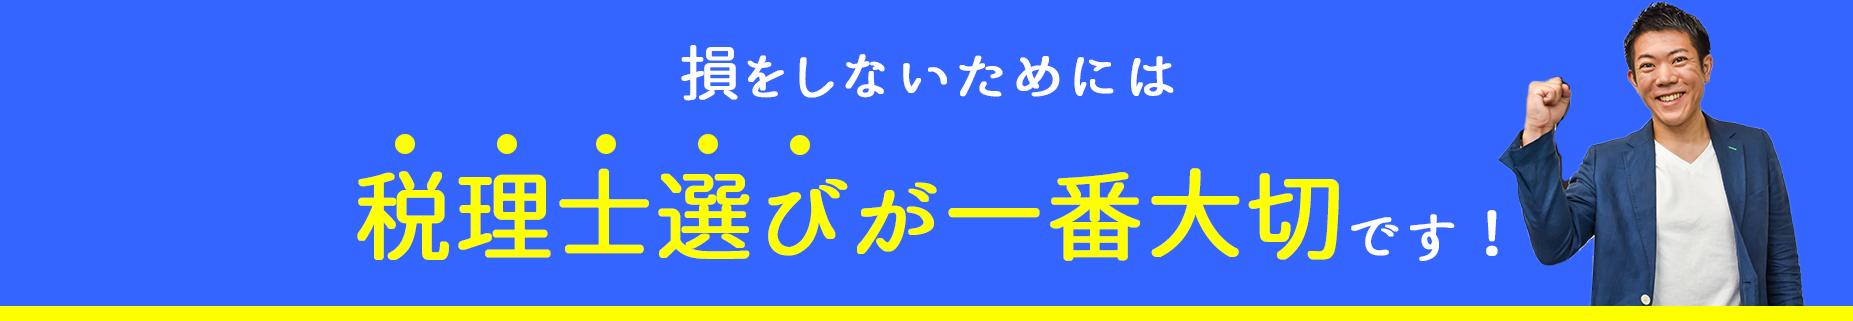 obi1 - TOP